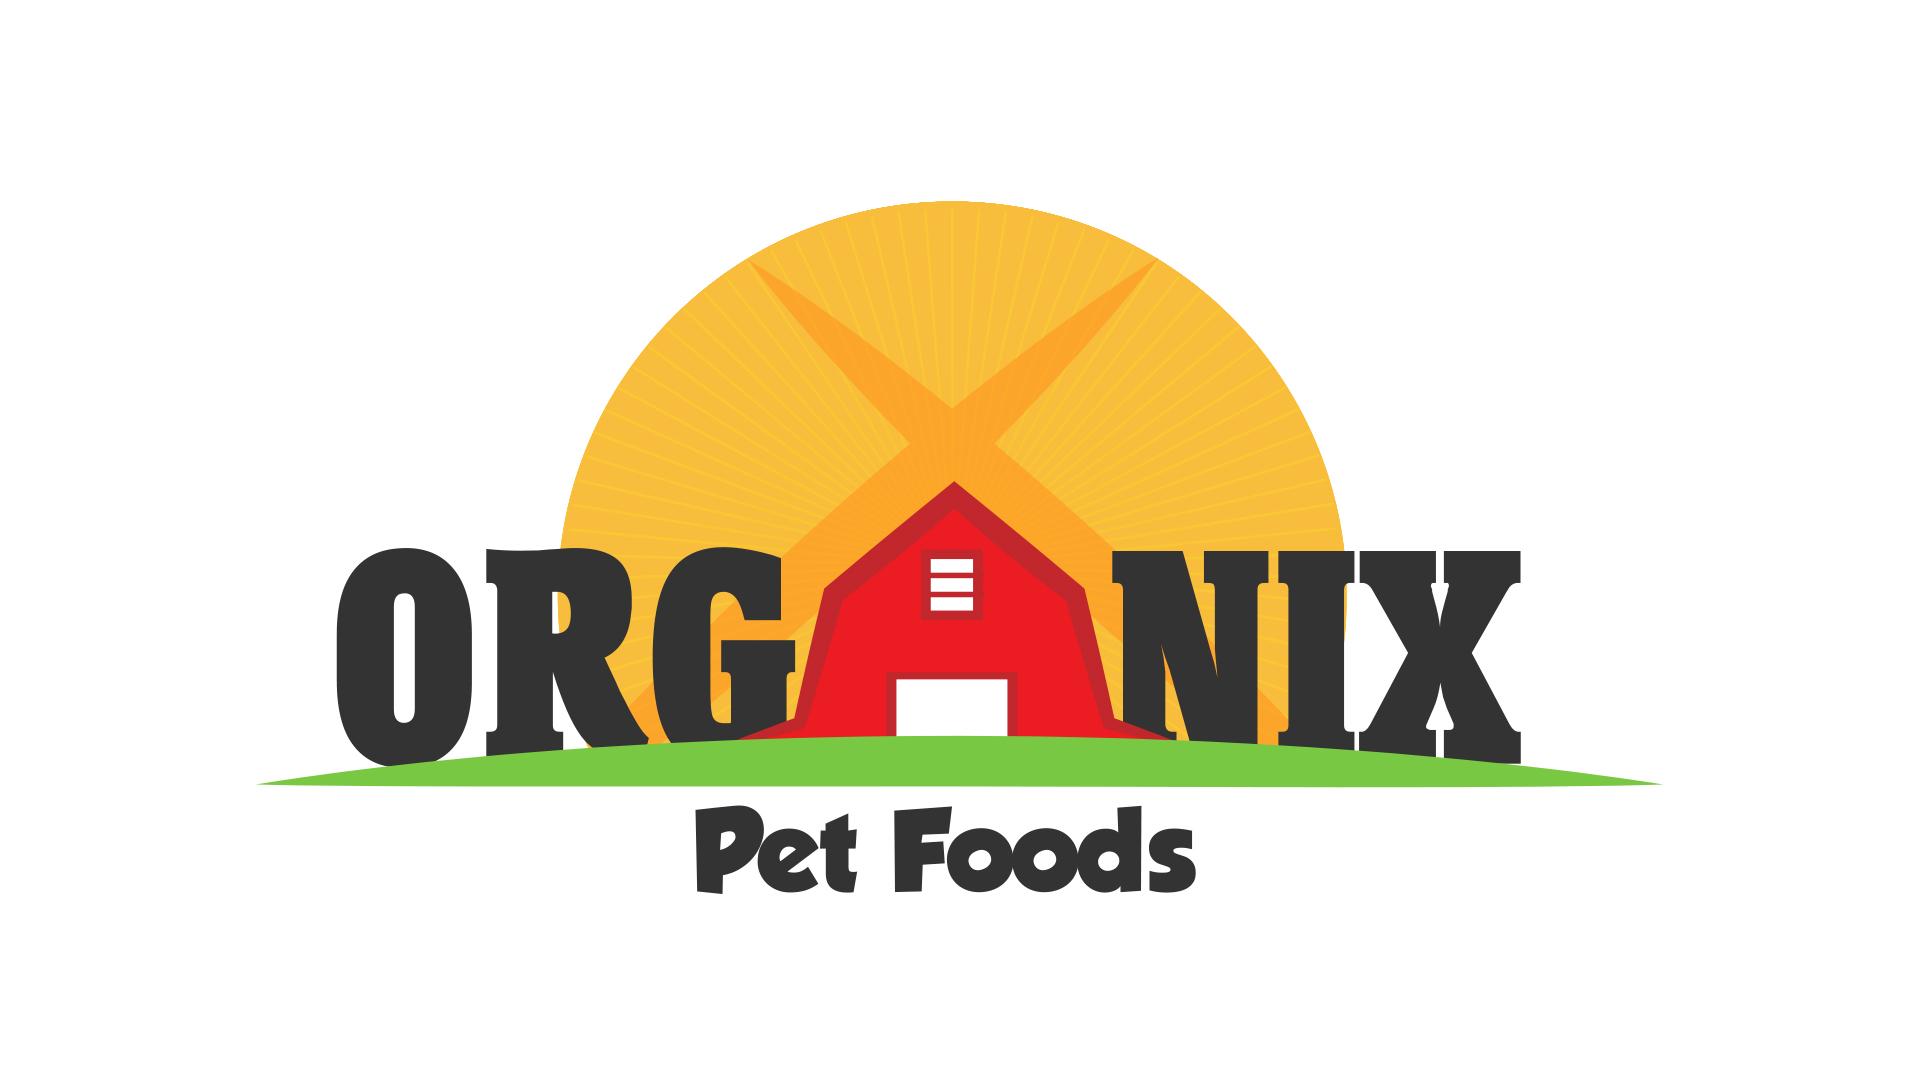 Organix Pet Food Branding Redesign